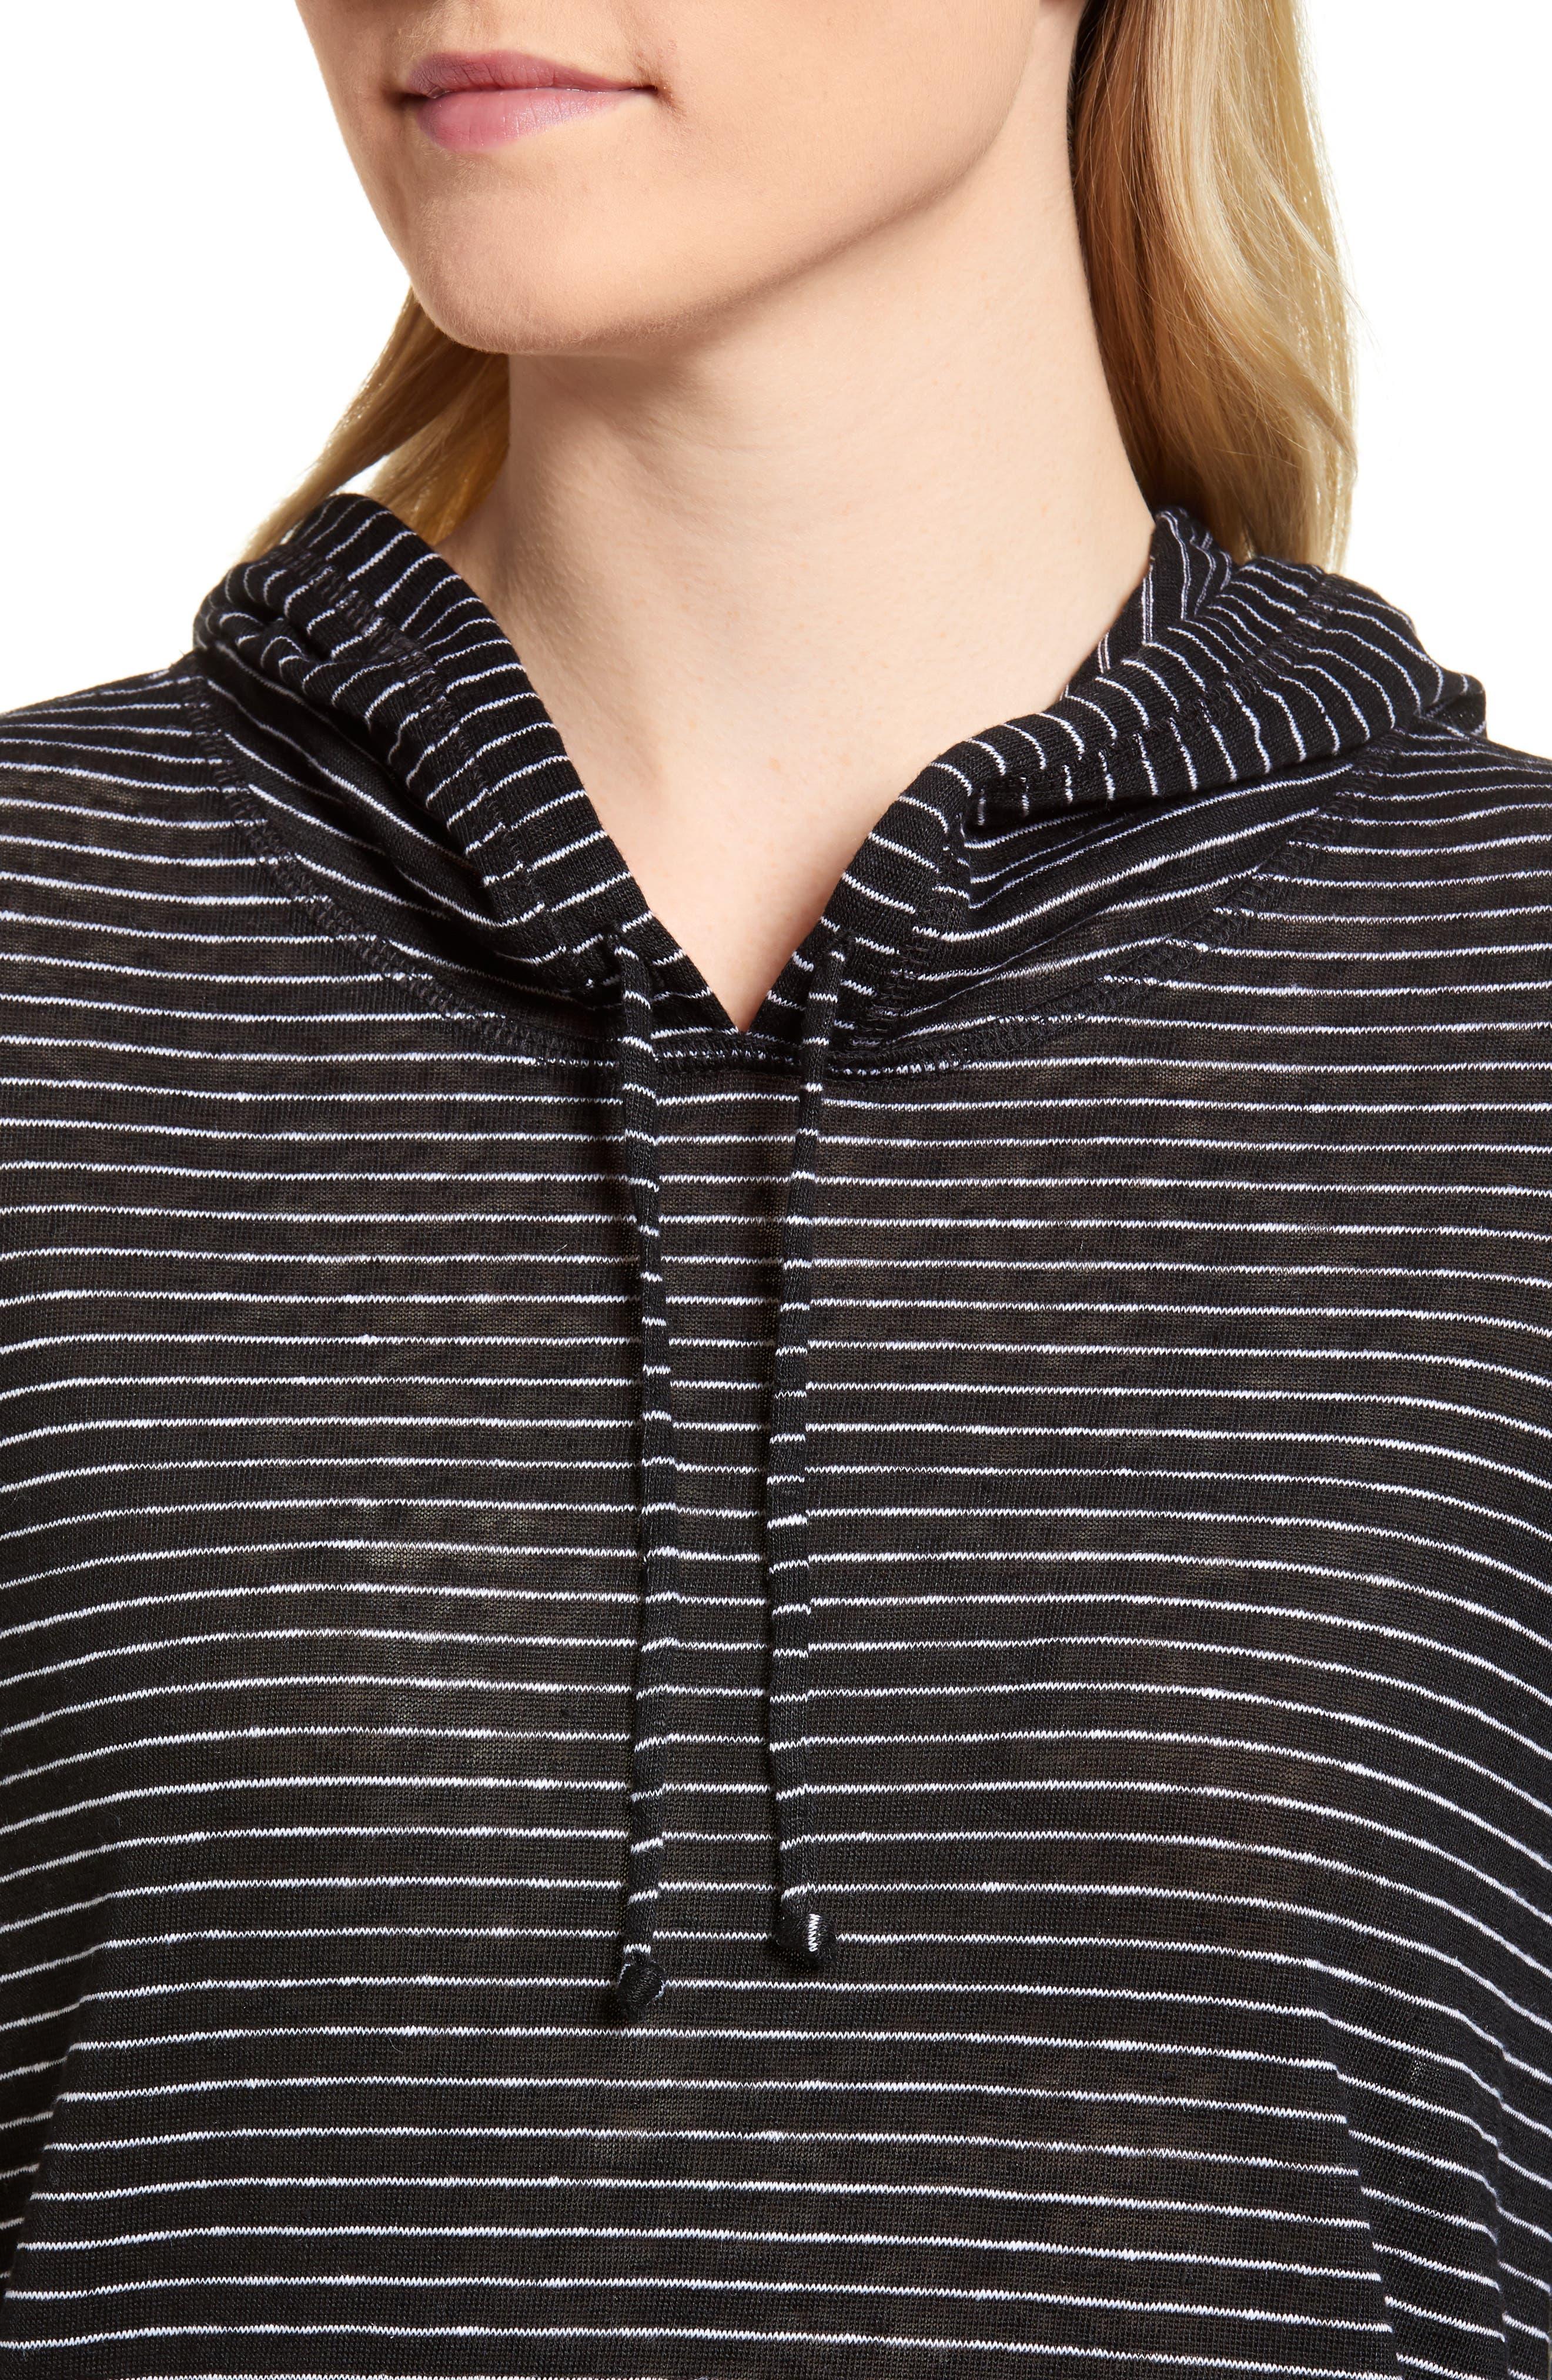 Knit Linen Hoodie,                             Alternate thumbnail 4, color,                             BLACK- IVORY SKINNY STRIPE